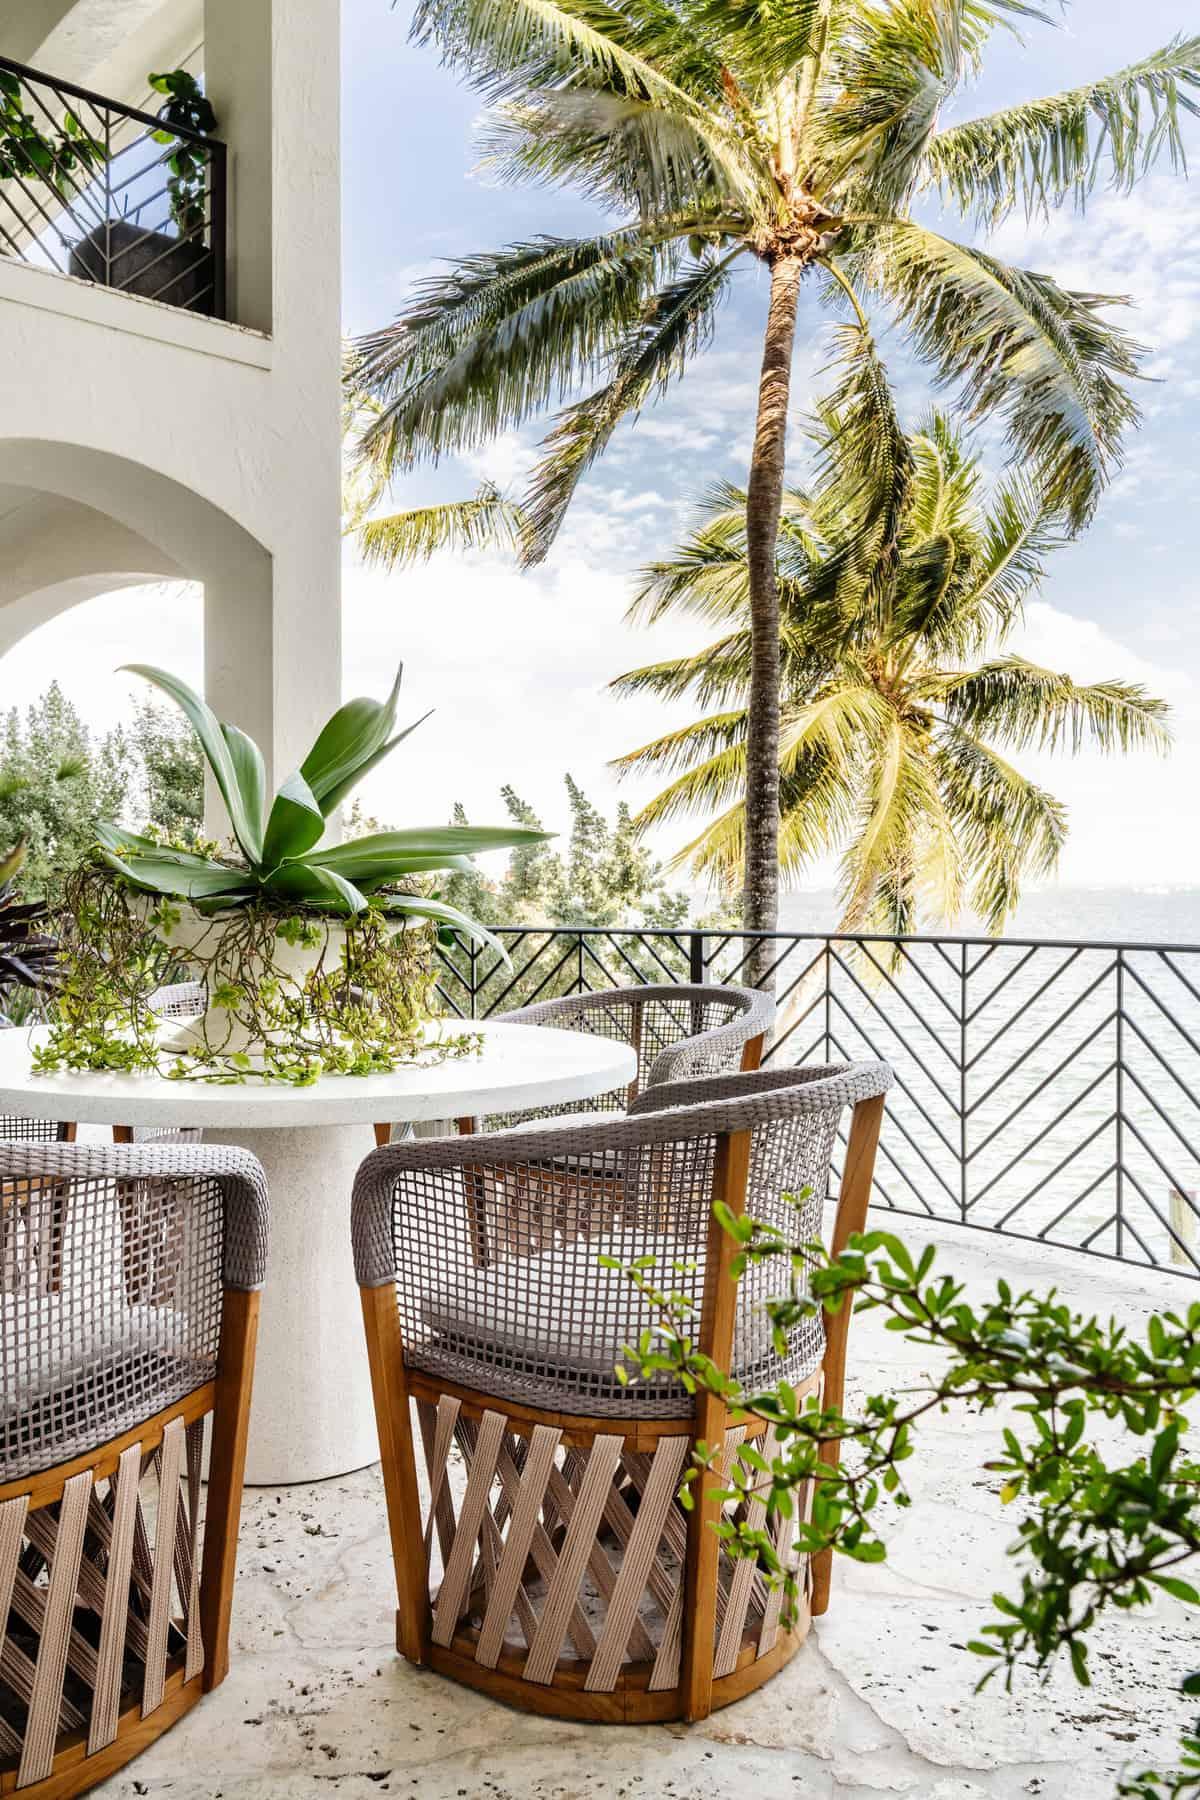 hacienda-spanish-style-balcony